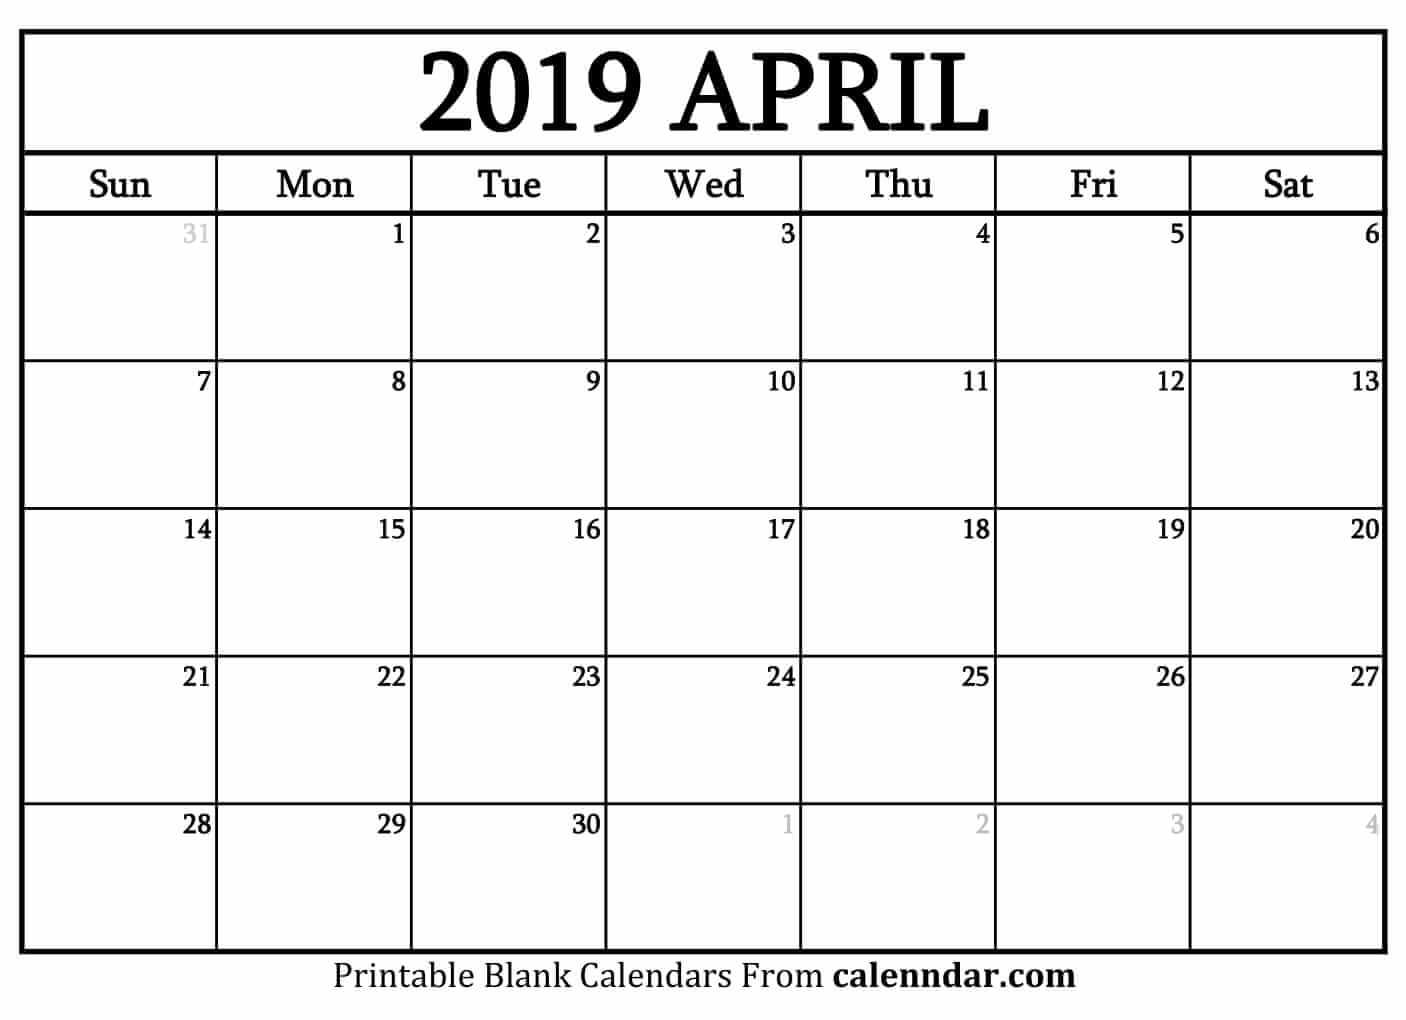 Blank Calendar Templates 2019